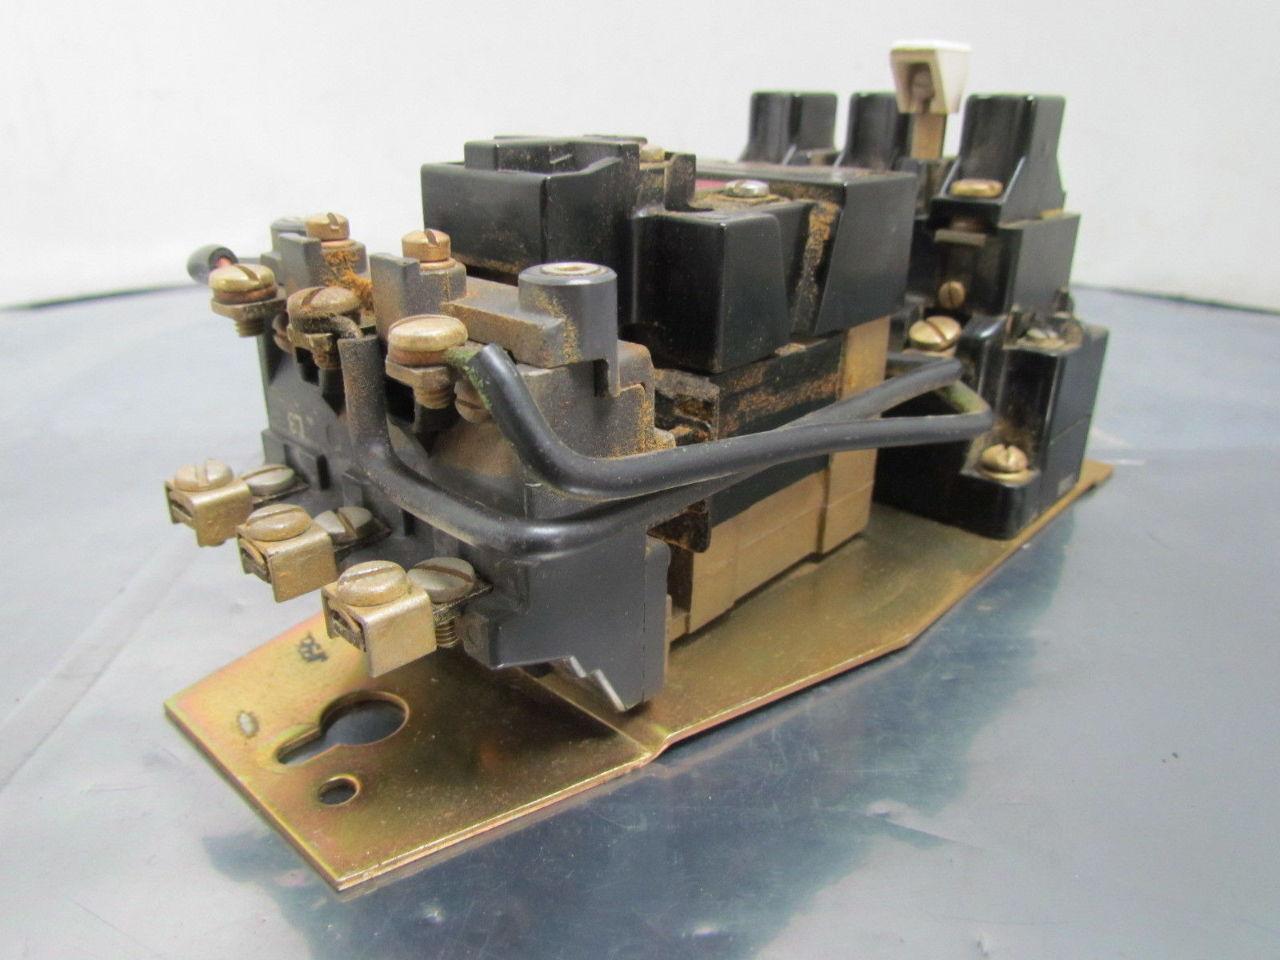 709 aod16 709 a0d16 motor starter 3 pole 120v coil ser k for Sizing motor starters and overloads